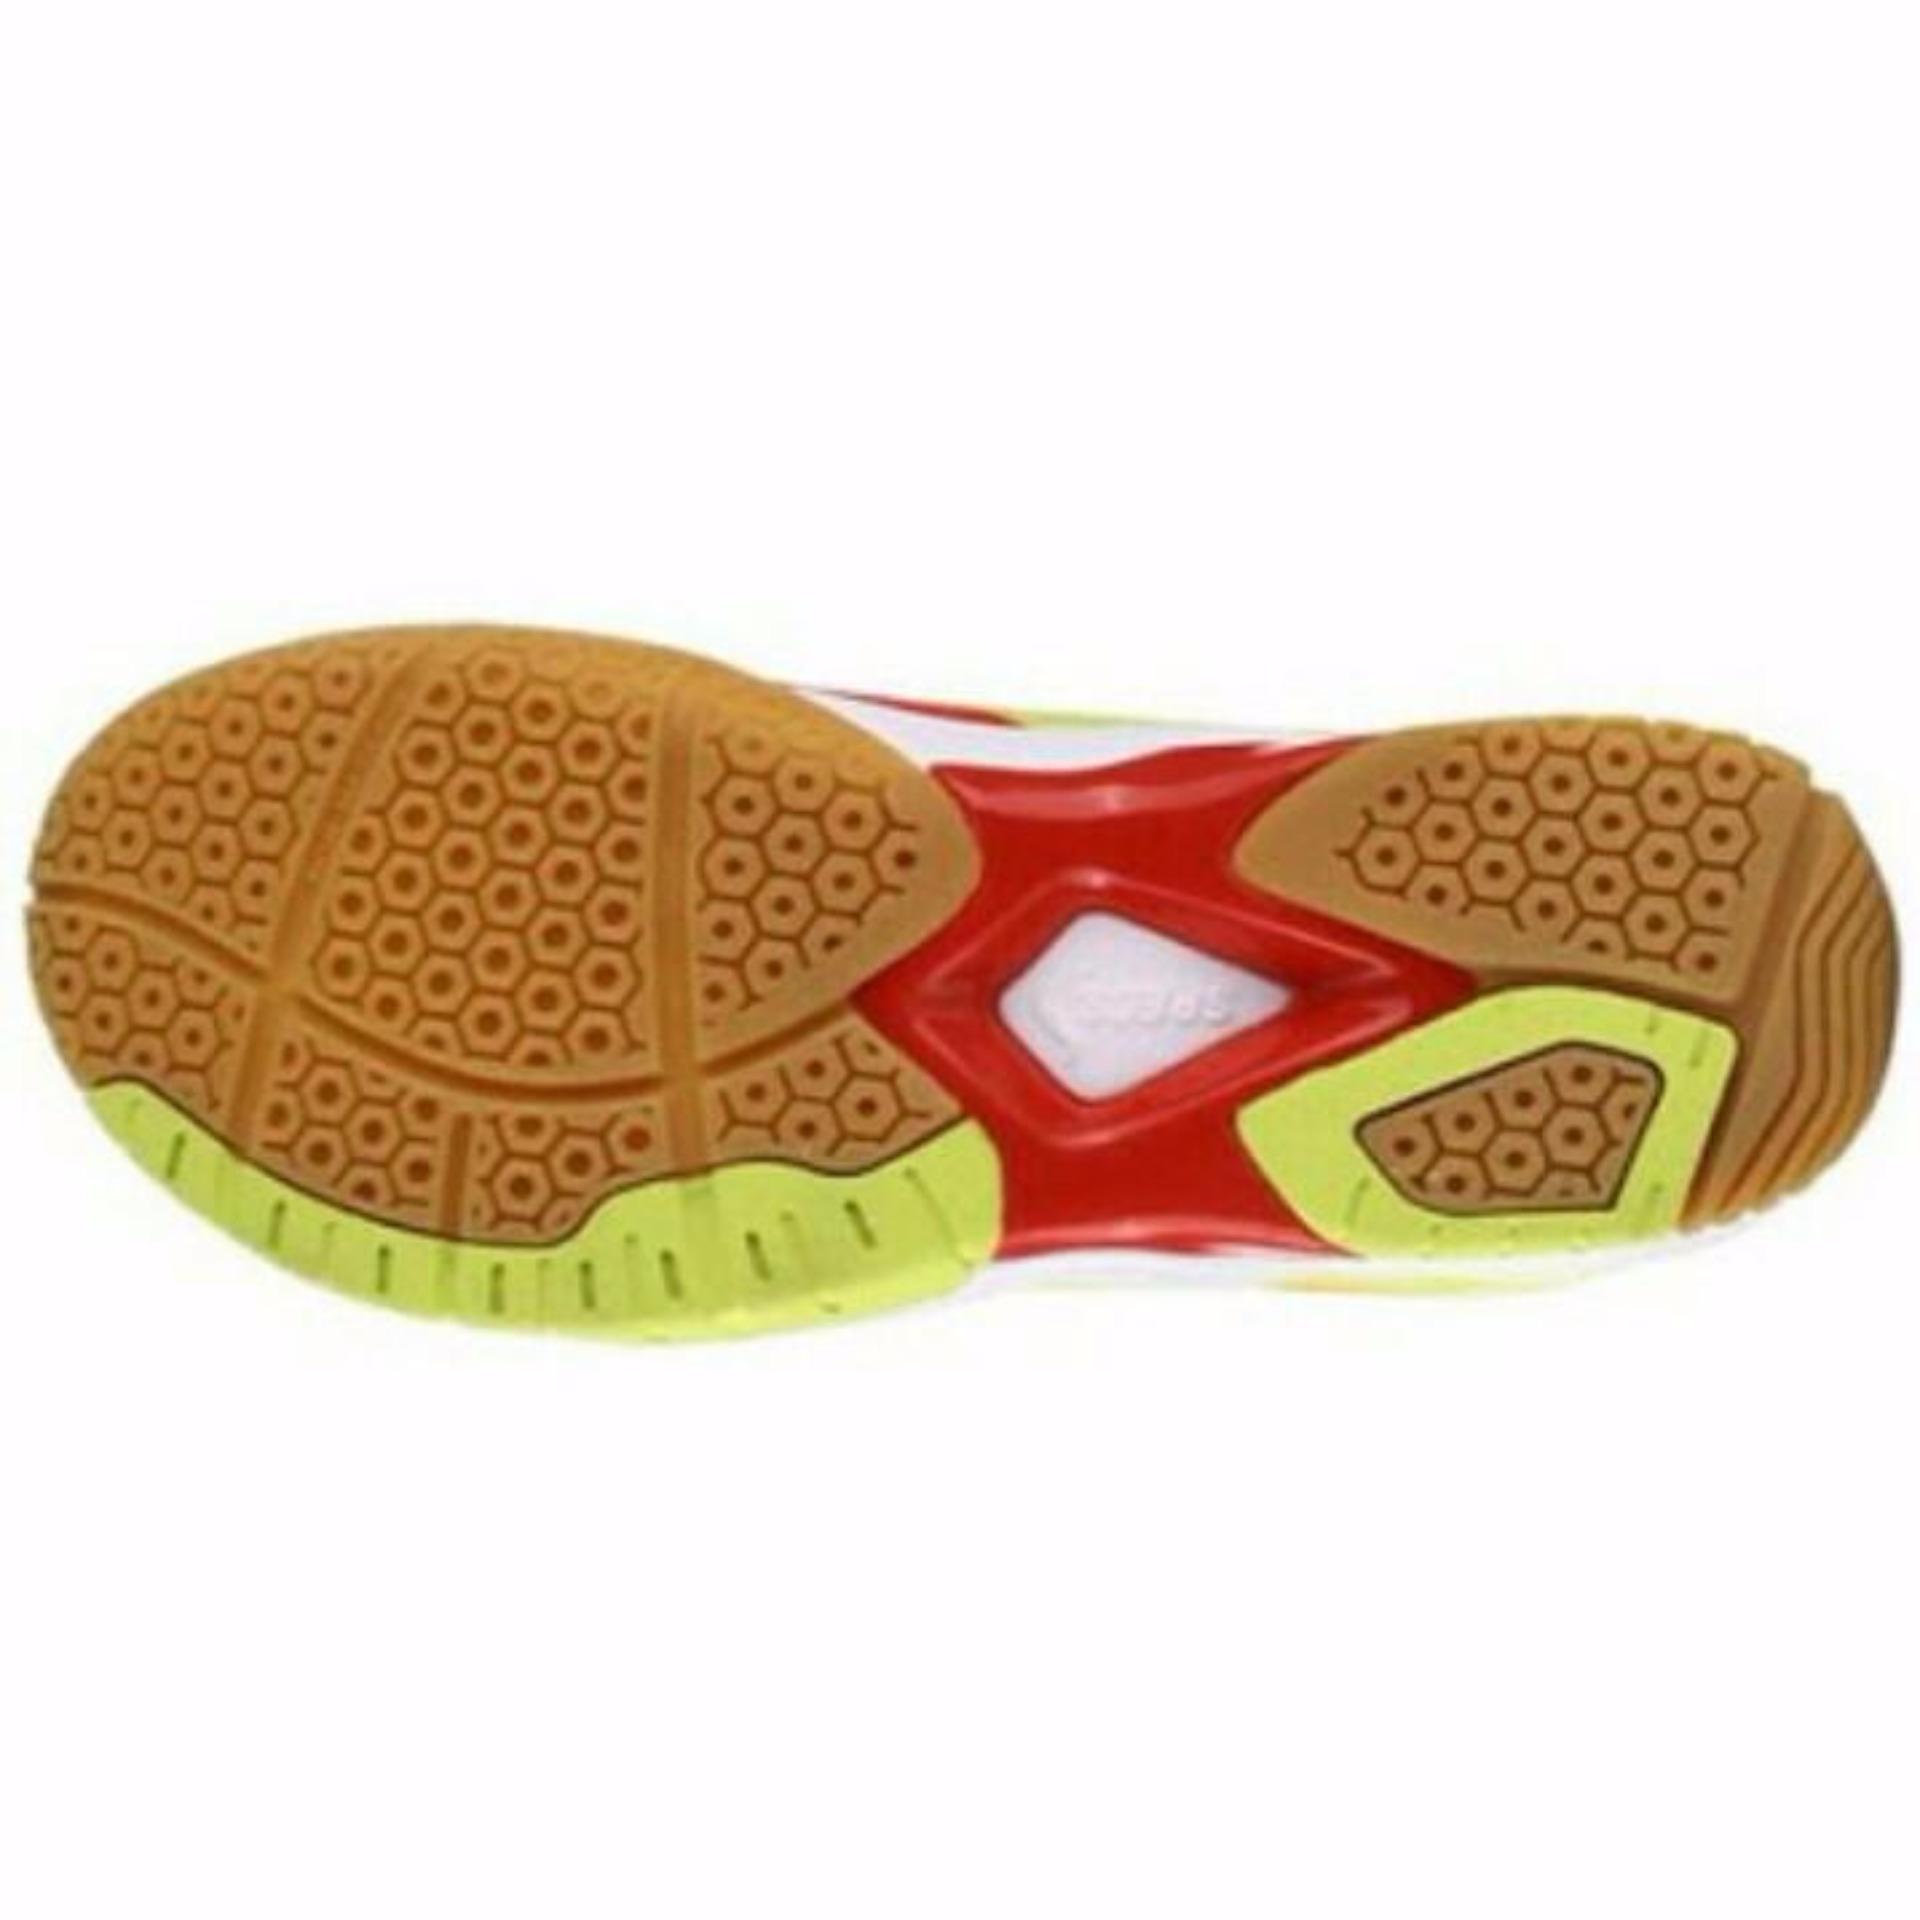 Specs BALDR Sepatu Badminton - emperor red/solar slime/white .